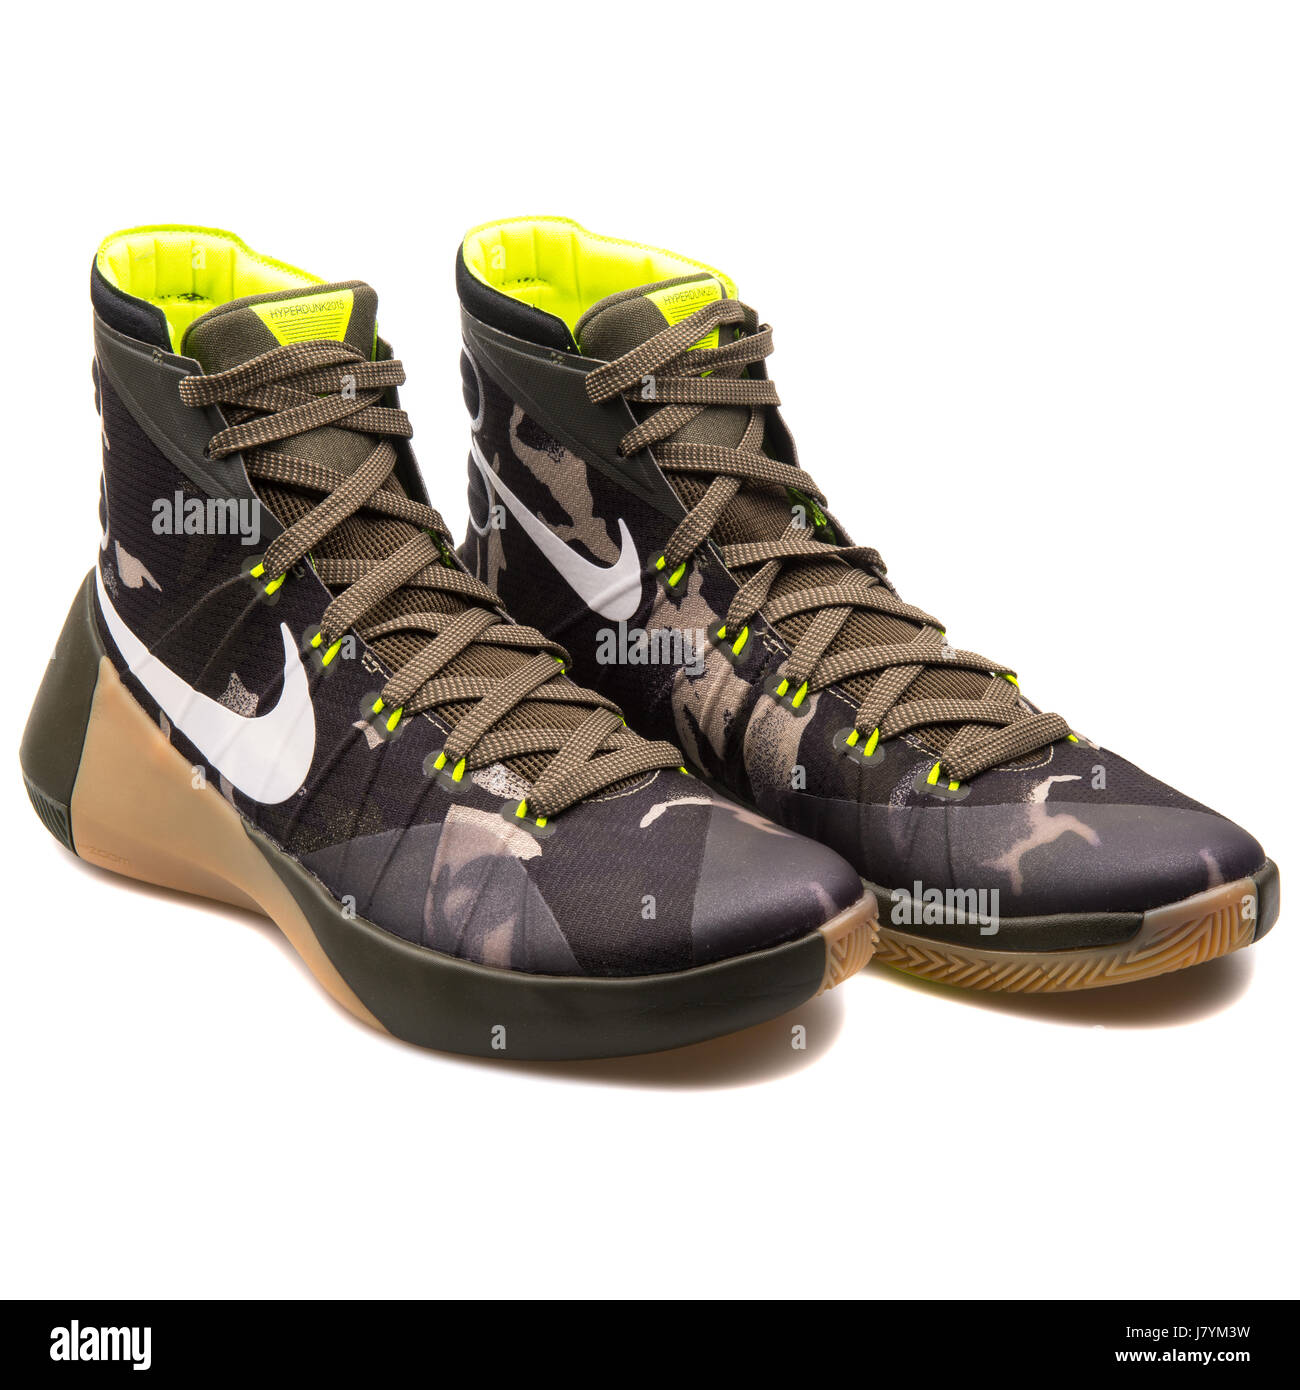 designer fashion 5f177 16057 Nike Hyperdunk 2015 PRM Men Dark Camo Khaki Basketball Sneakers - 749567-313